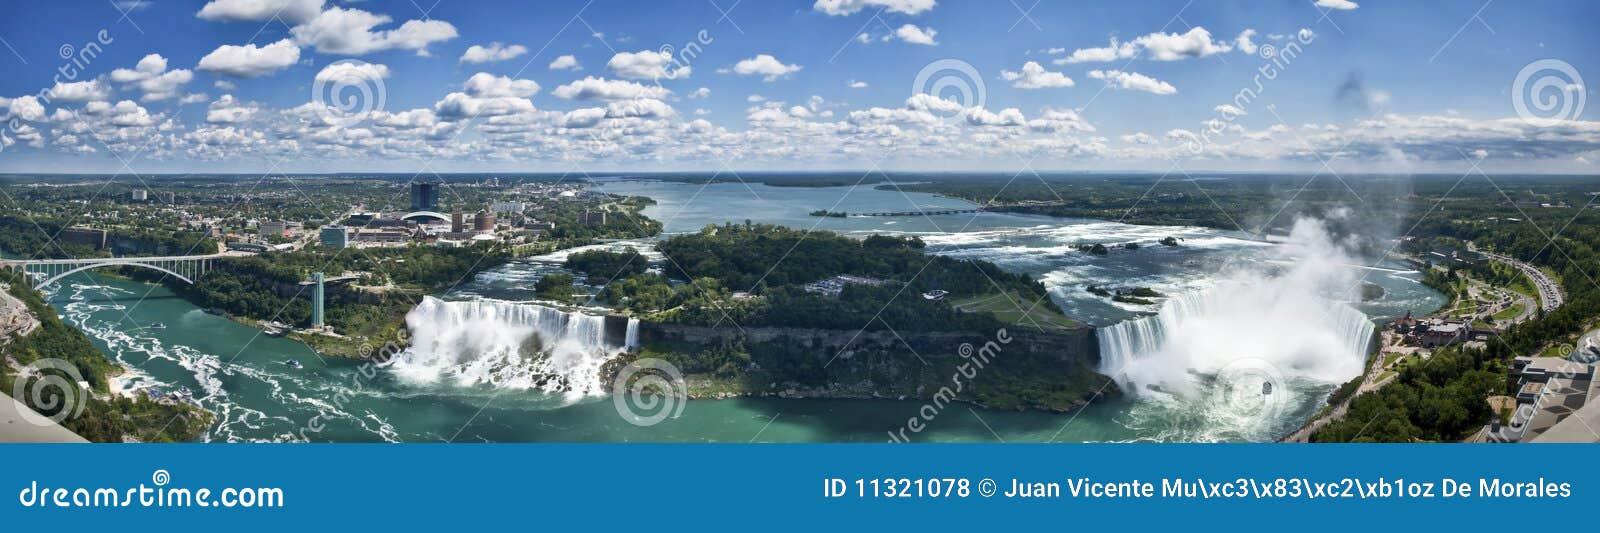 Het Panorama van het Niagara Falls